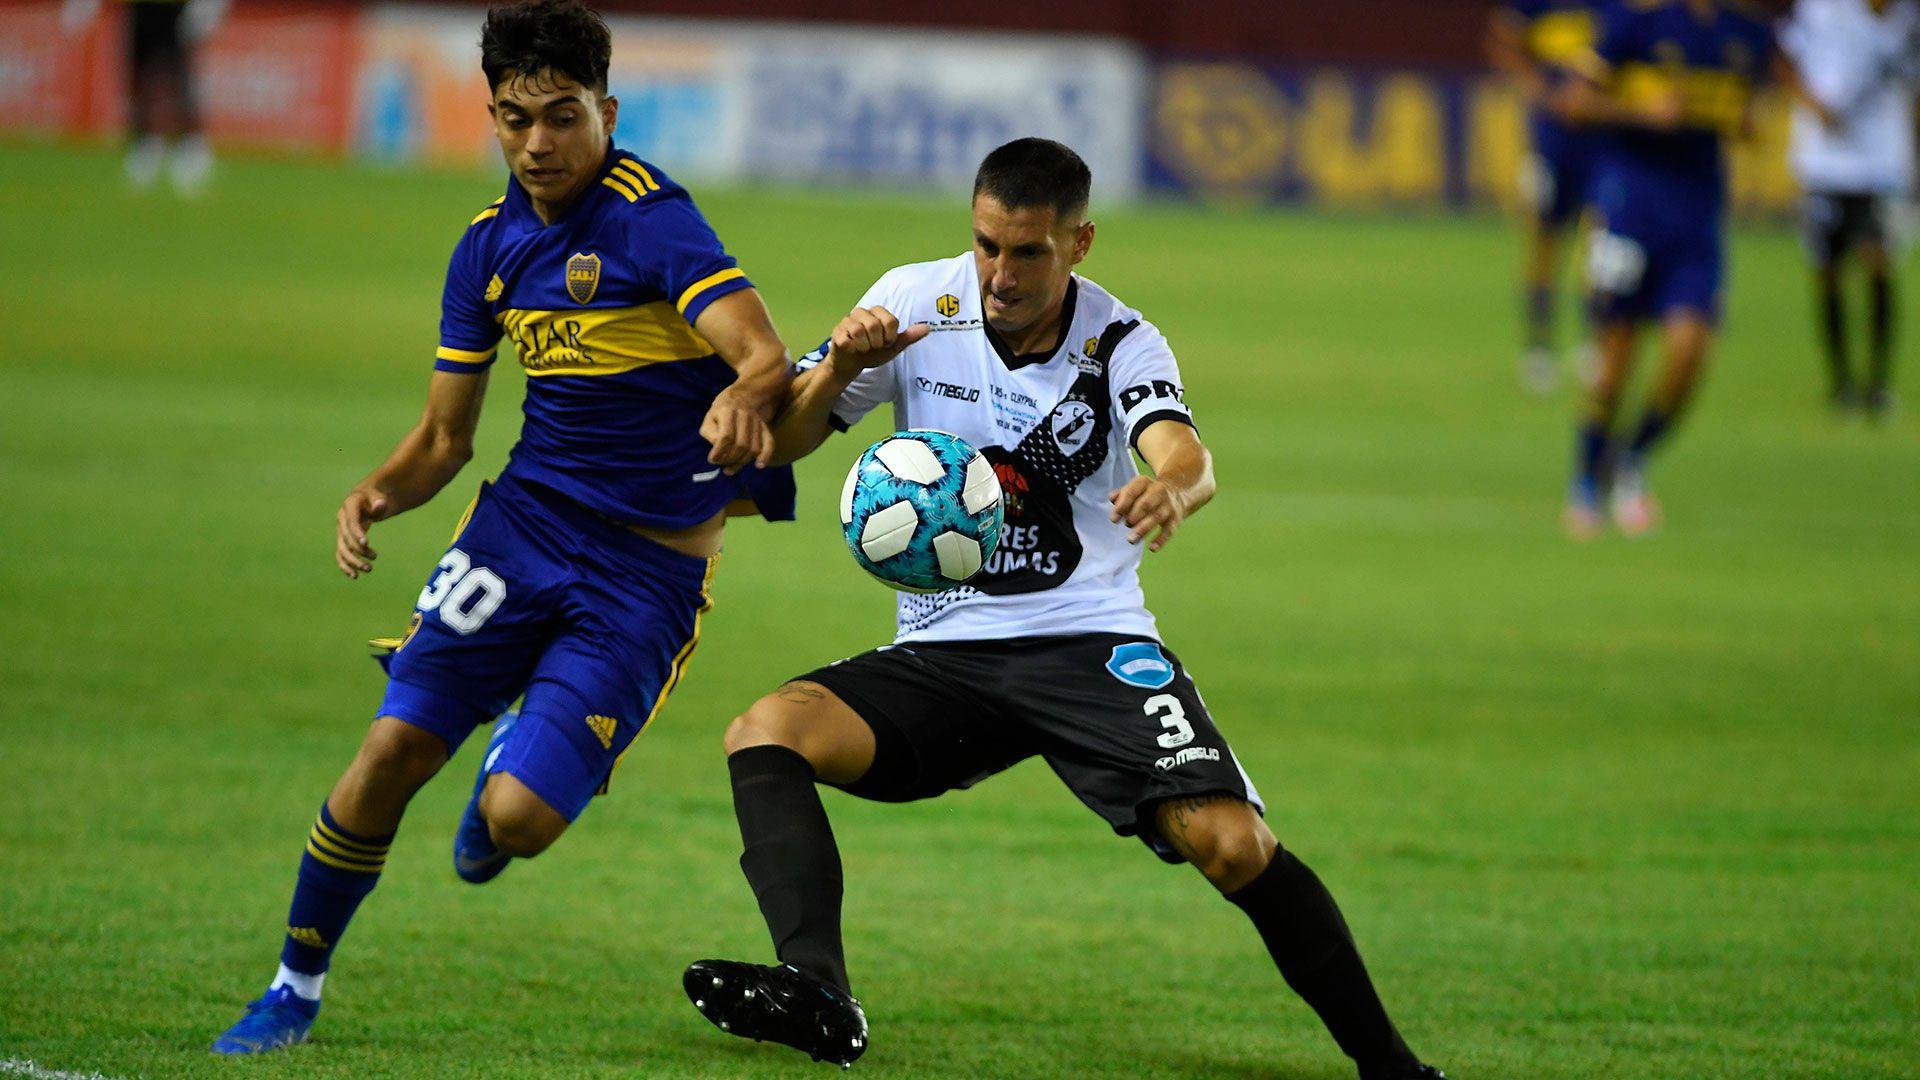 Boca Claypole copa argentina